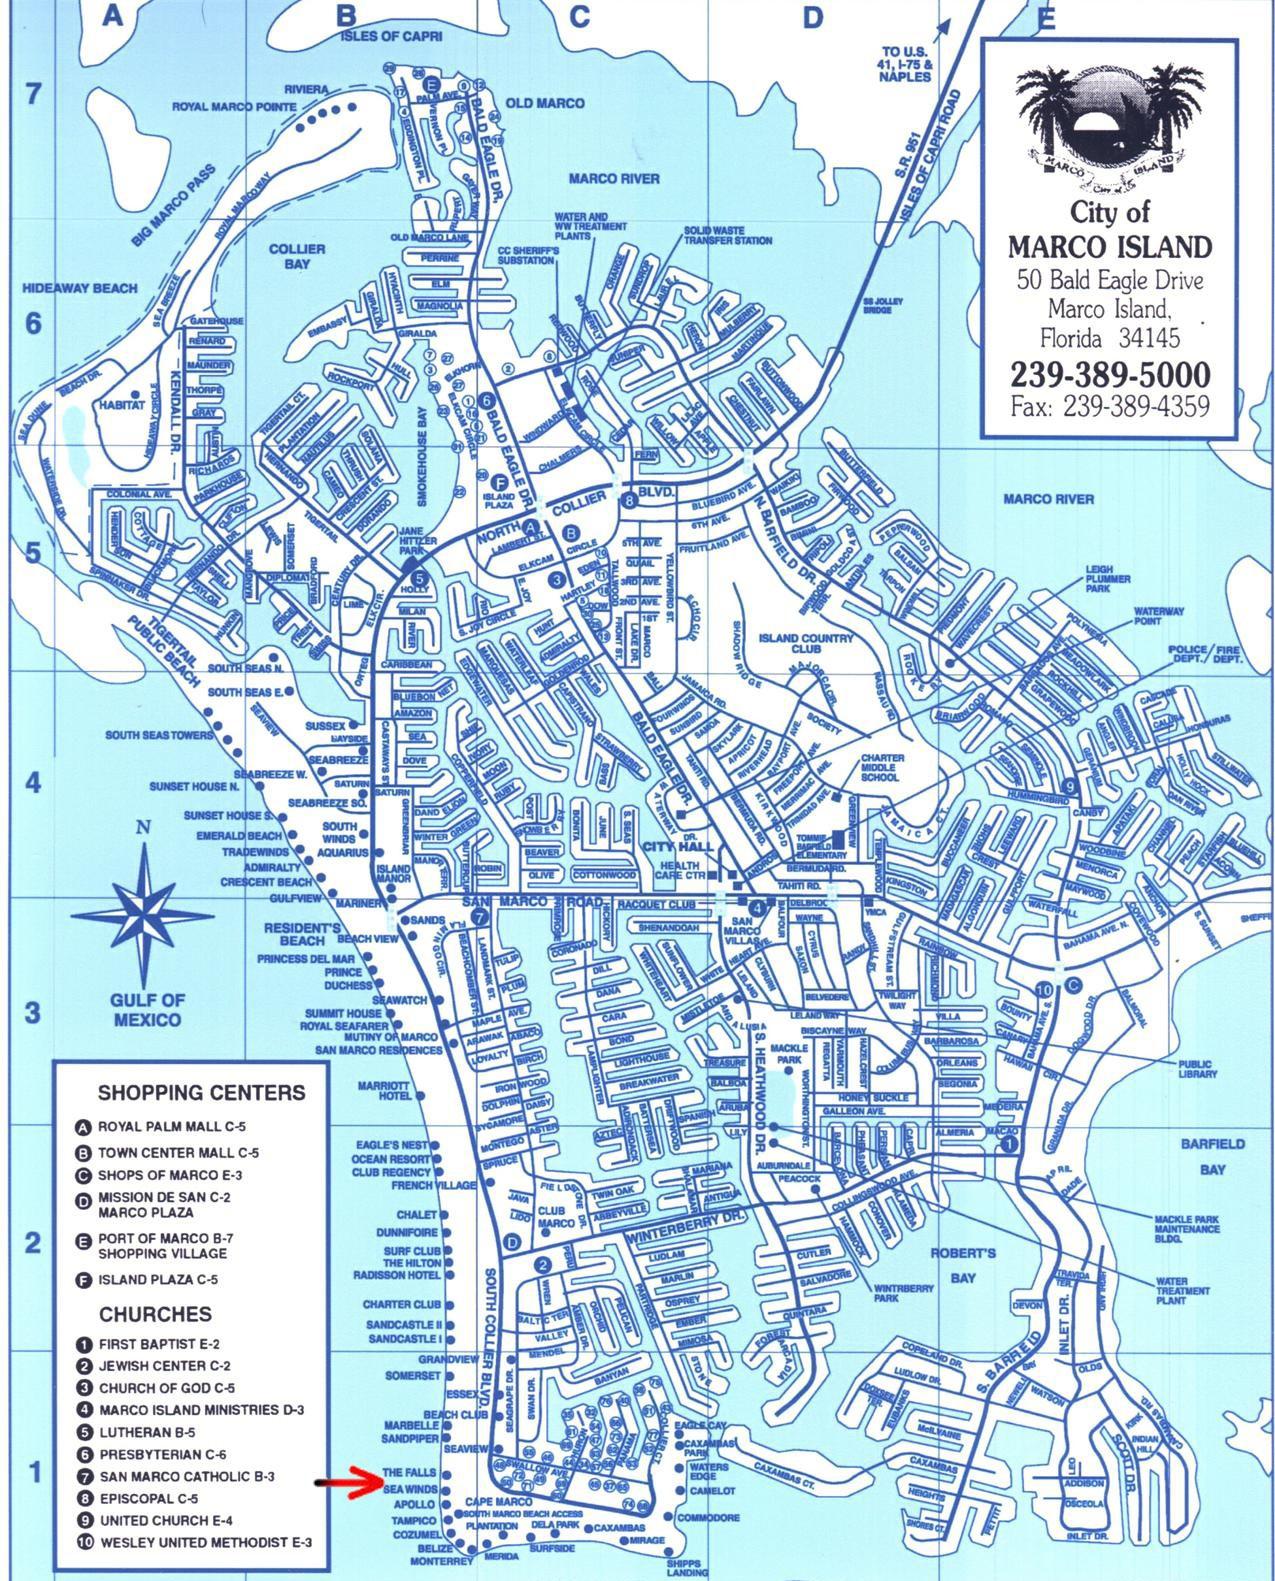 Map Of Marco Island Florida | Compressportnederland - Marco Island Florida Map